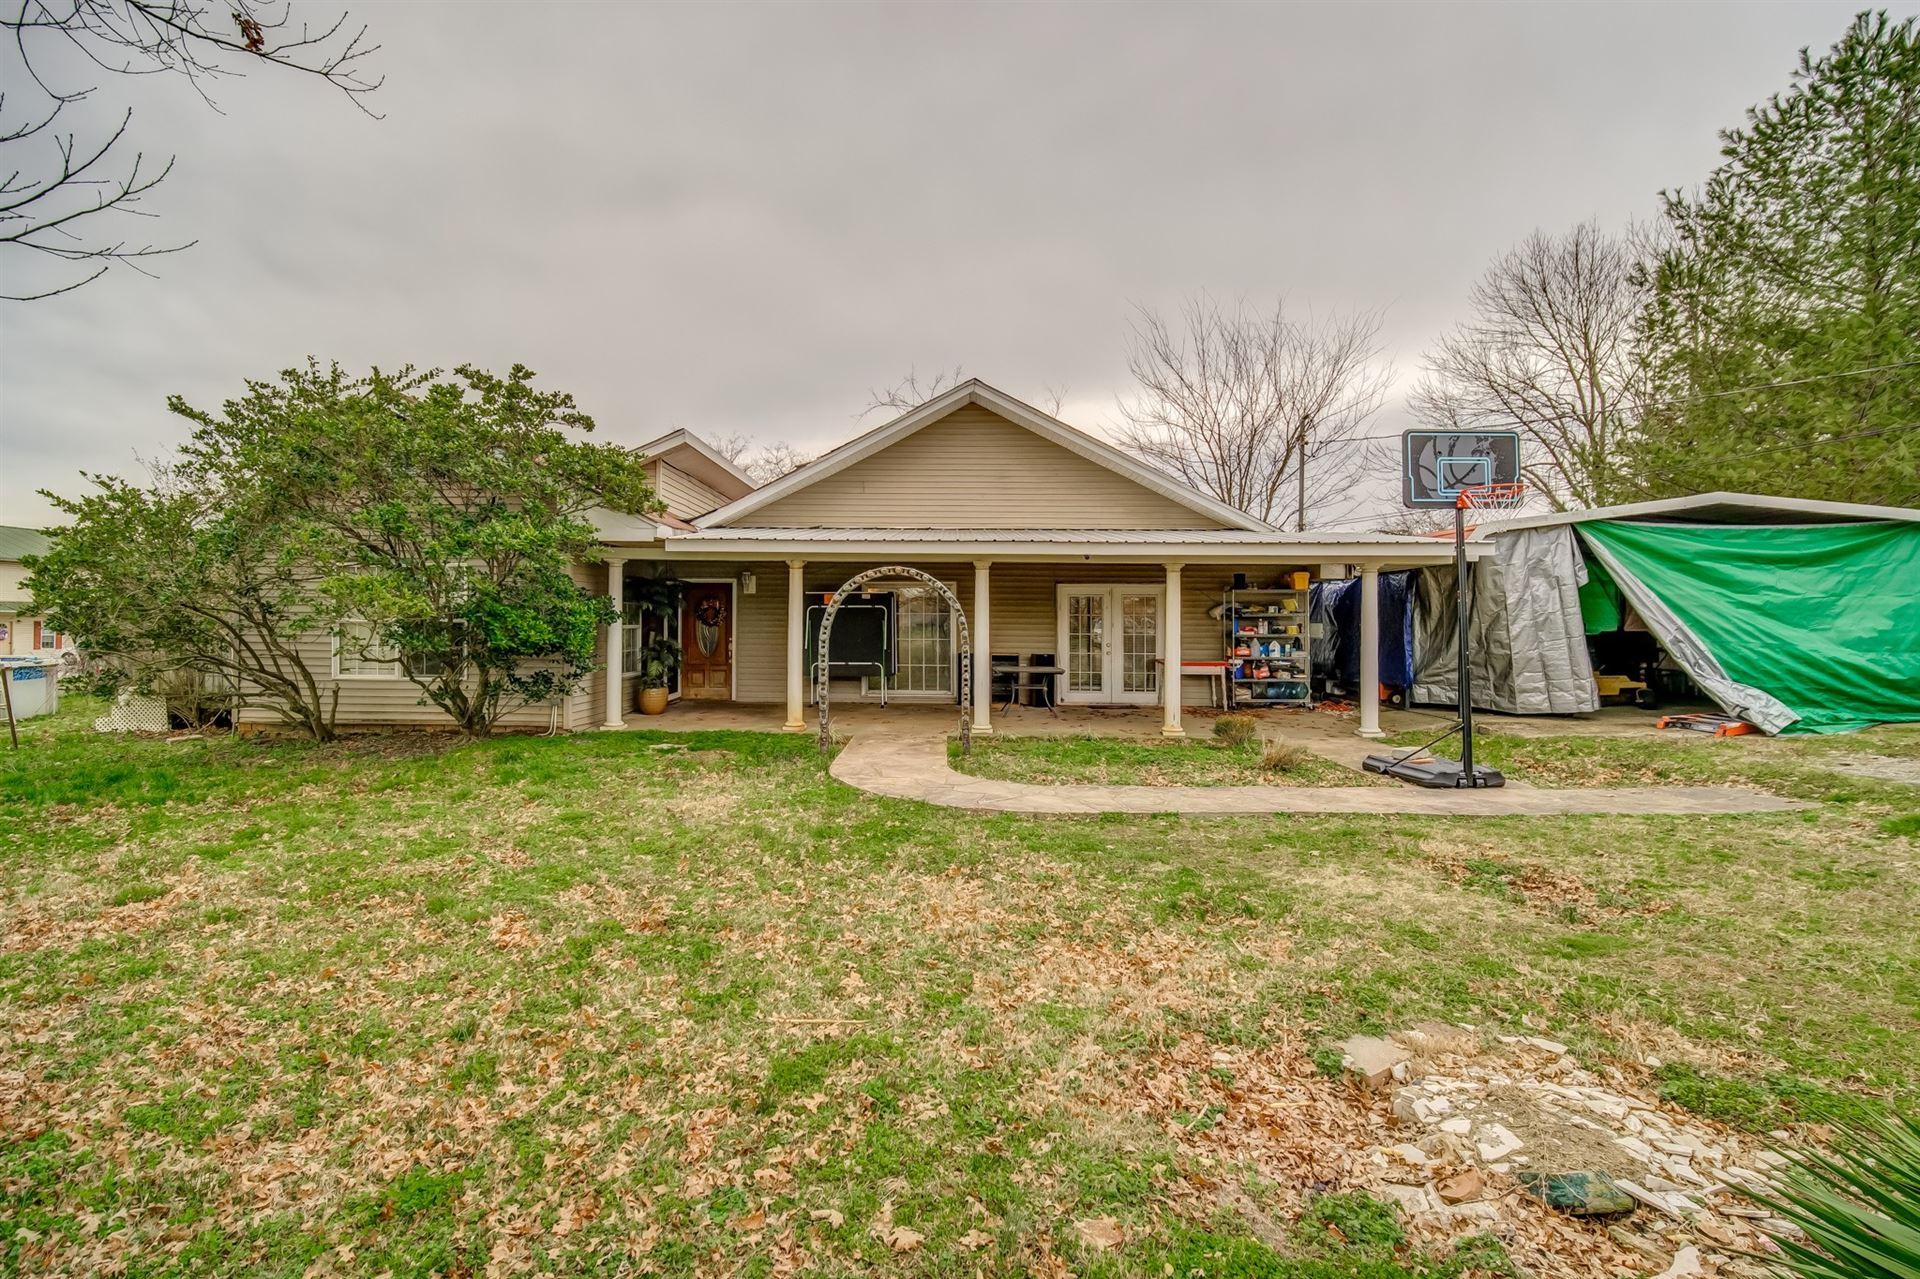 1203 Verona Caney Ave, Lewisburg, TN 37091 - MLS#: 2232191